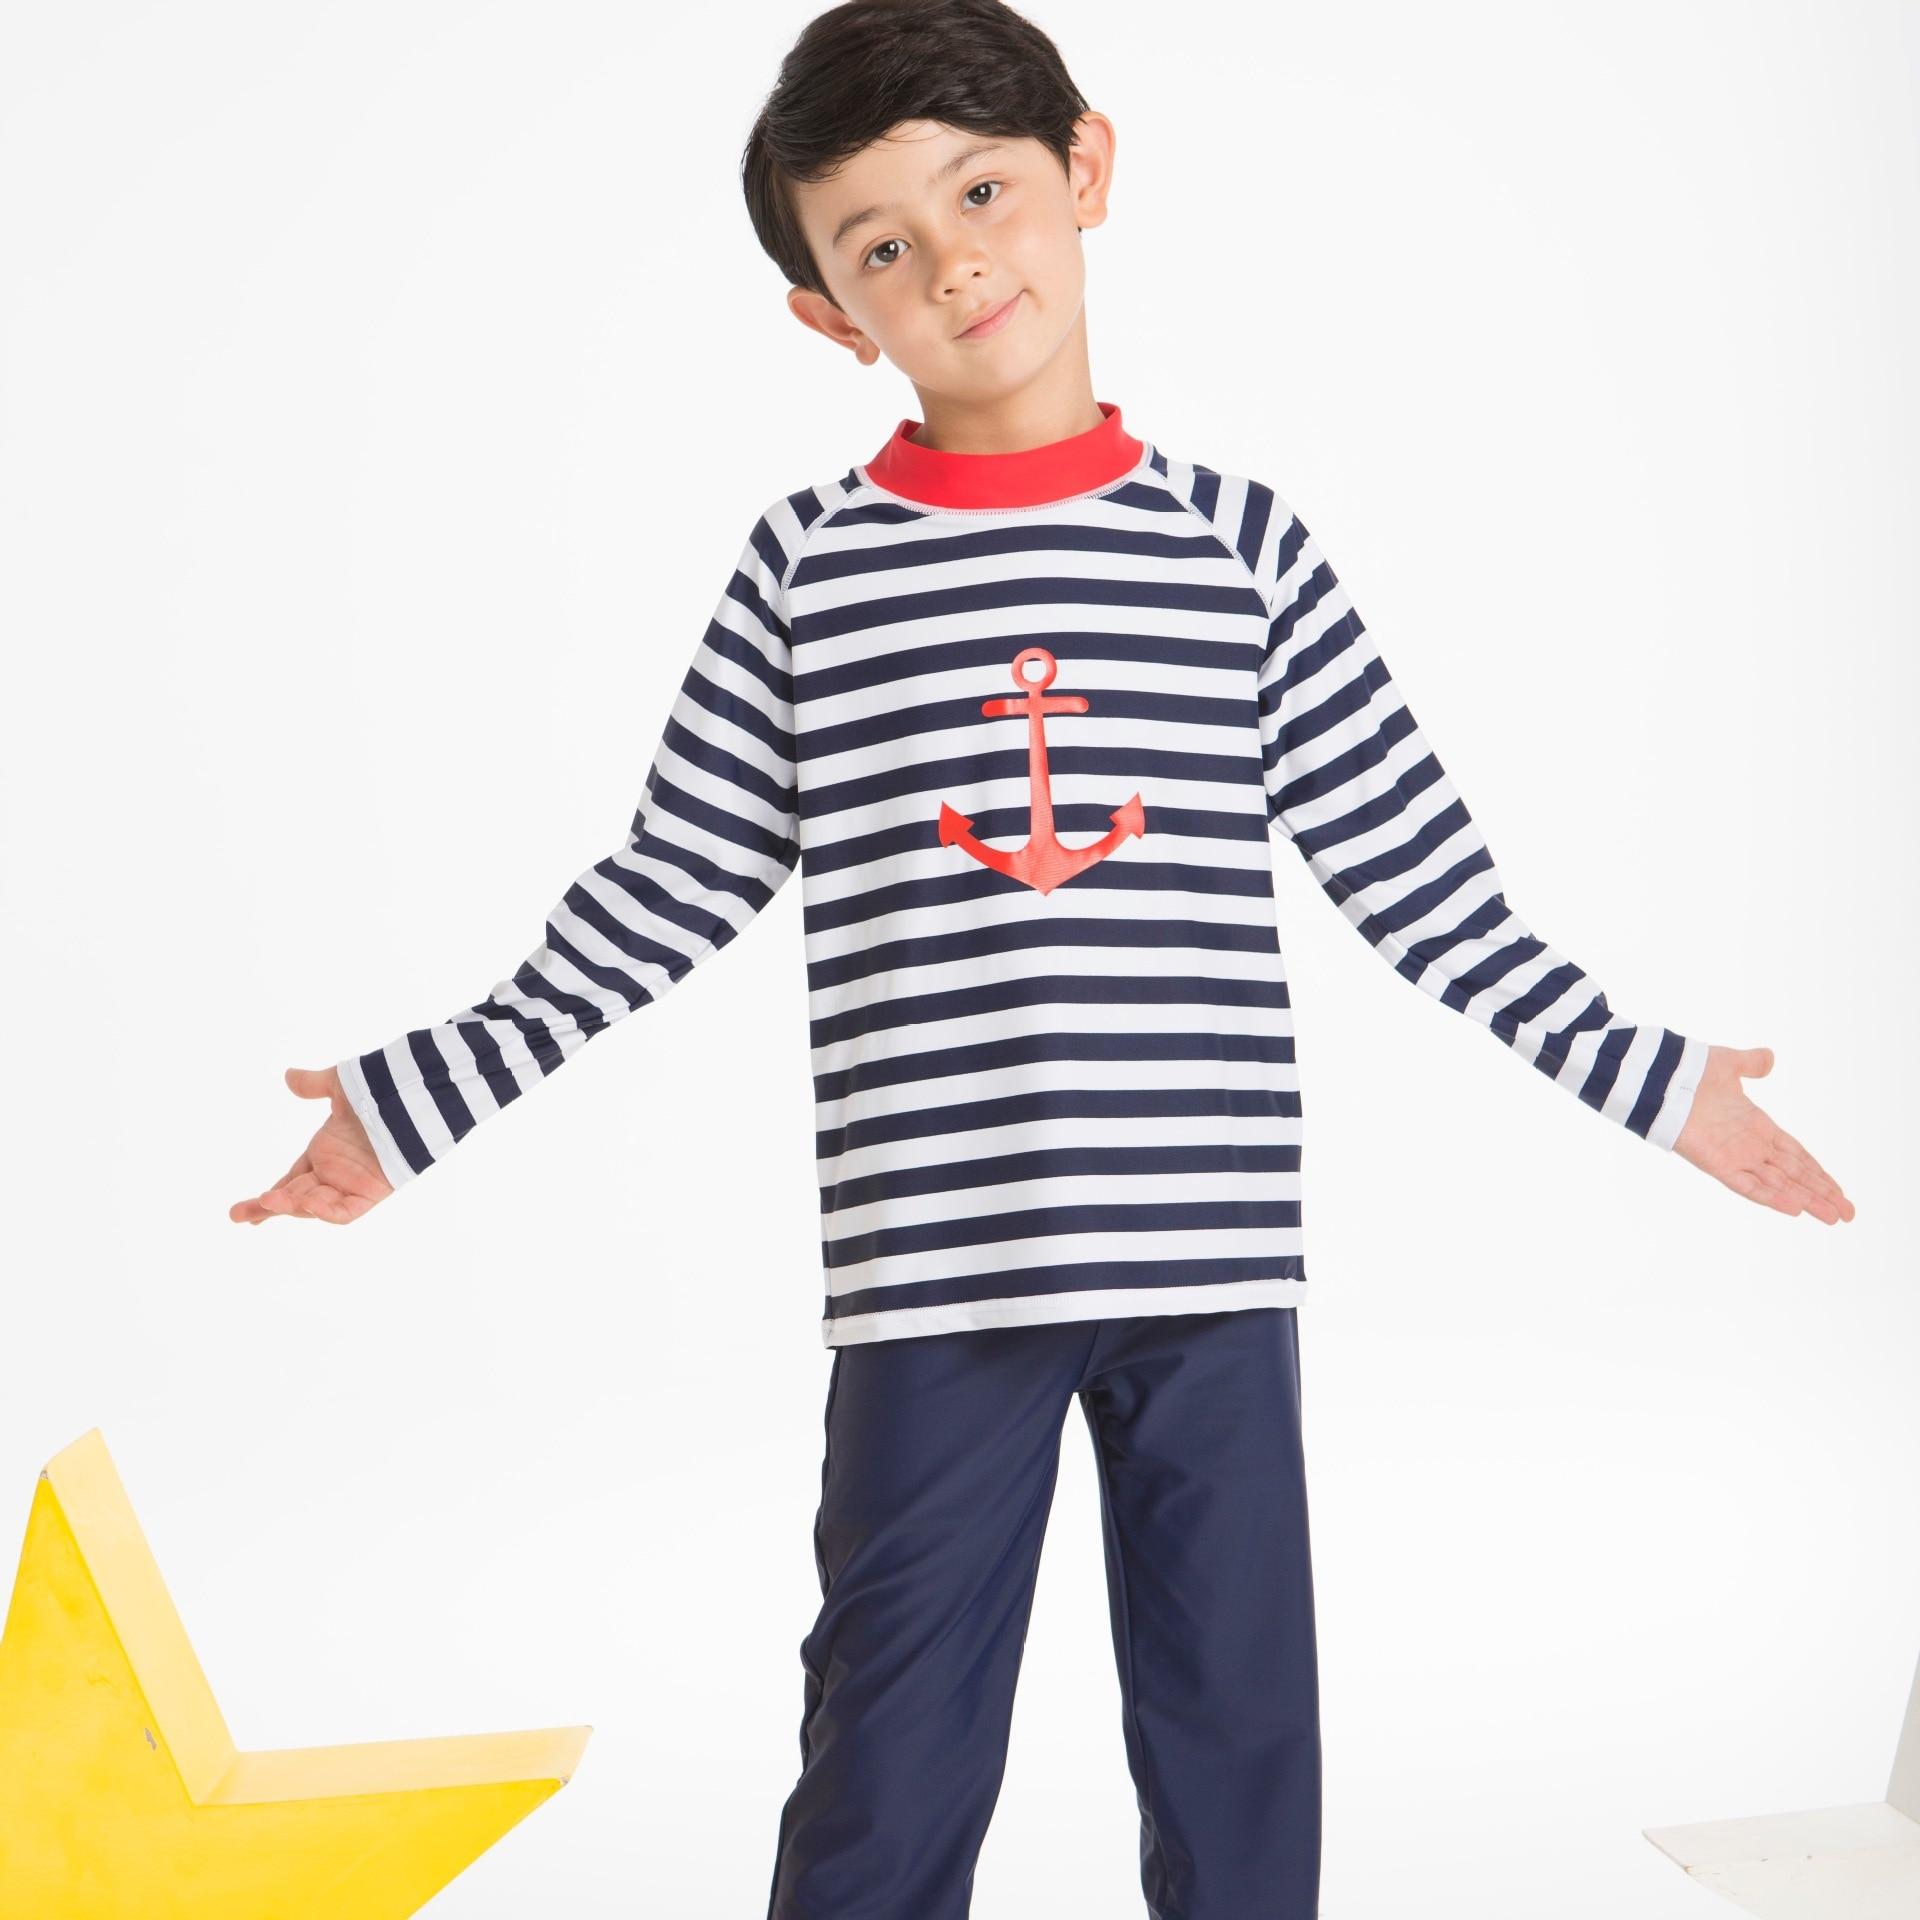 BOY'S Warm Swimsuit Set Large BOY'S Navy Style Sun-resistant Waterproof Mother Quick-Dry Snorkeling Sportswear